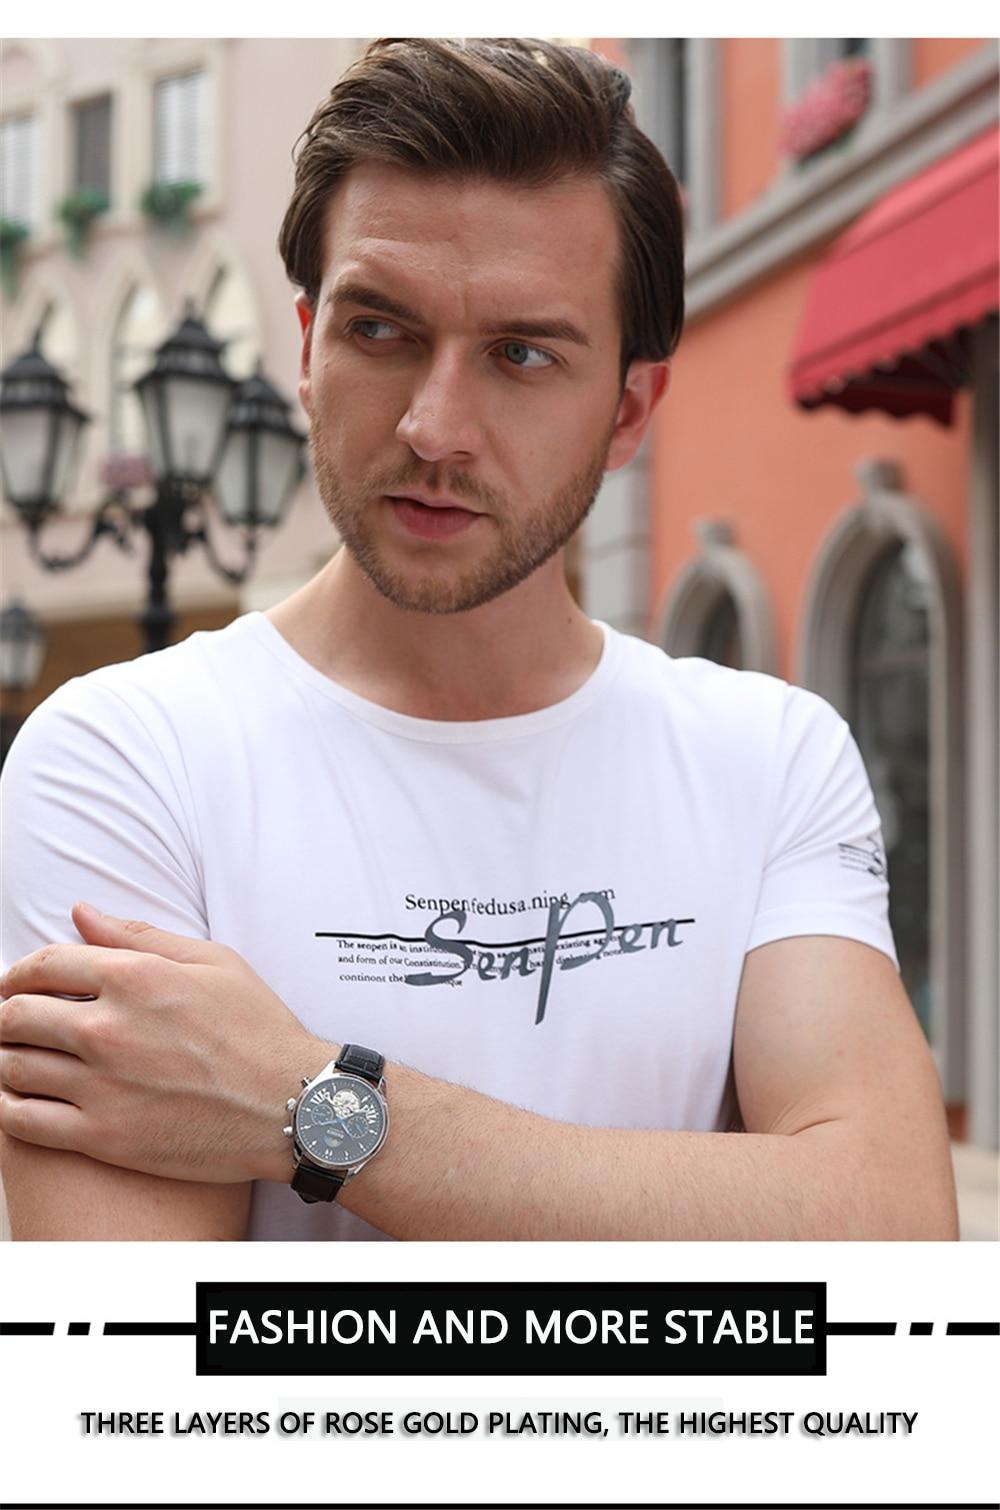 HTB1GK1FXLvsK1Rjy0Fiq6zwtXXal HAIQIN luxury Automatic Mechanical Men Watch classic Business Watch men Tourbillon Waterproof Male Wristwatch Relogio Masculino